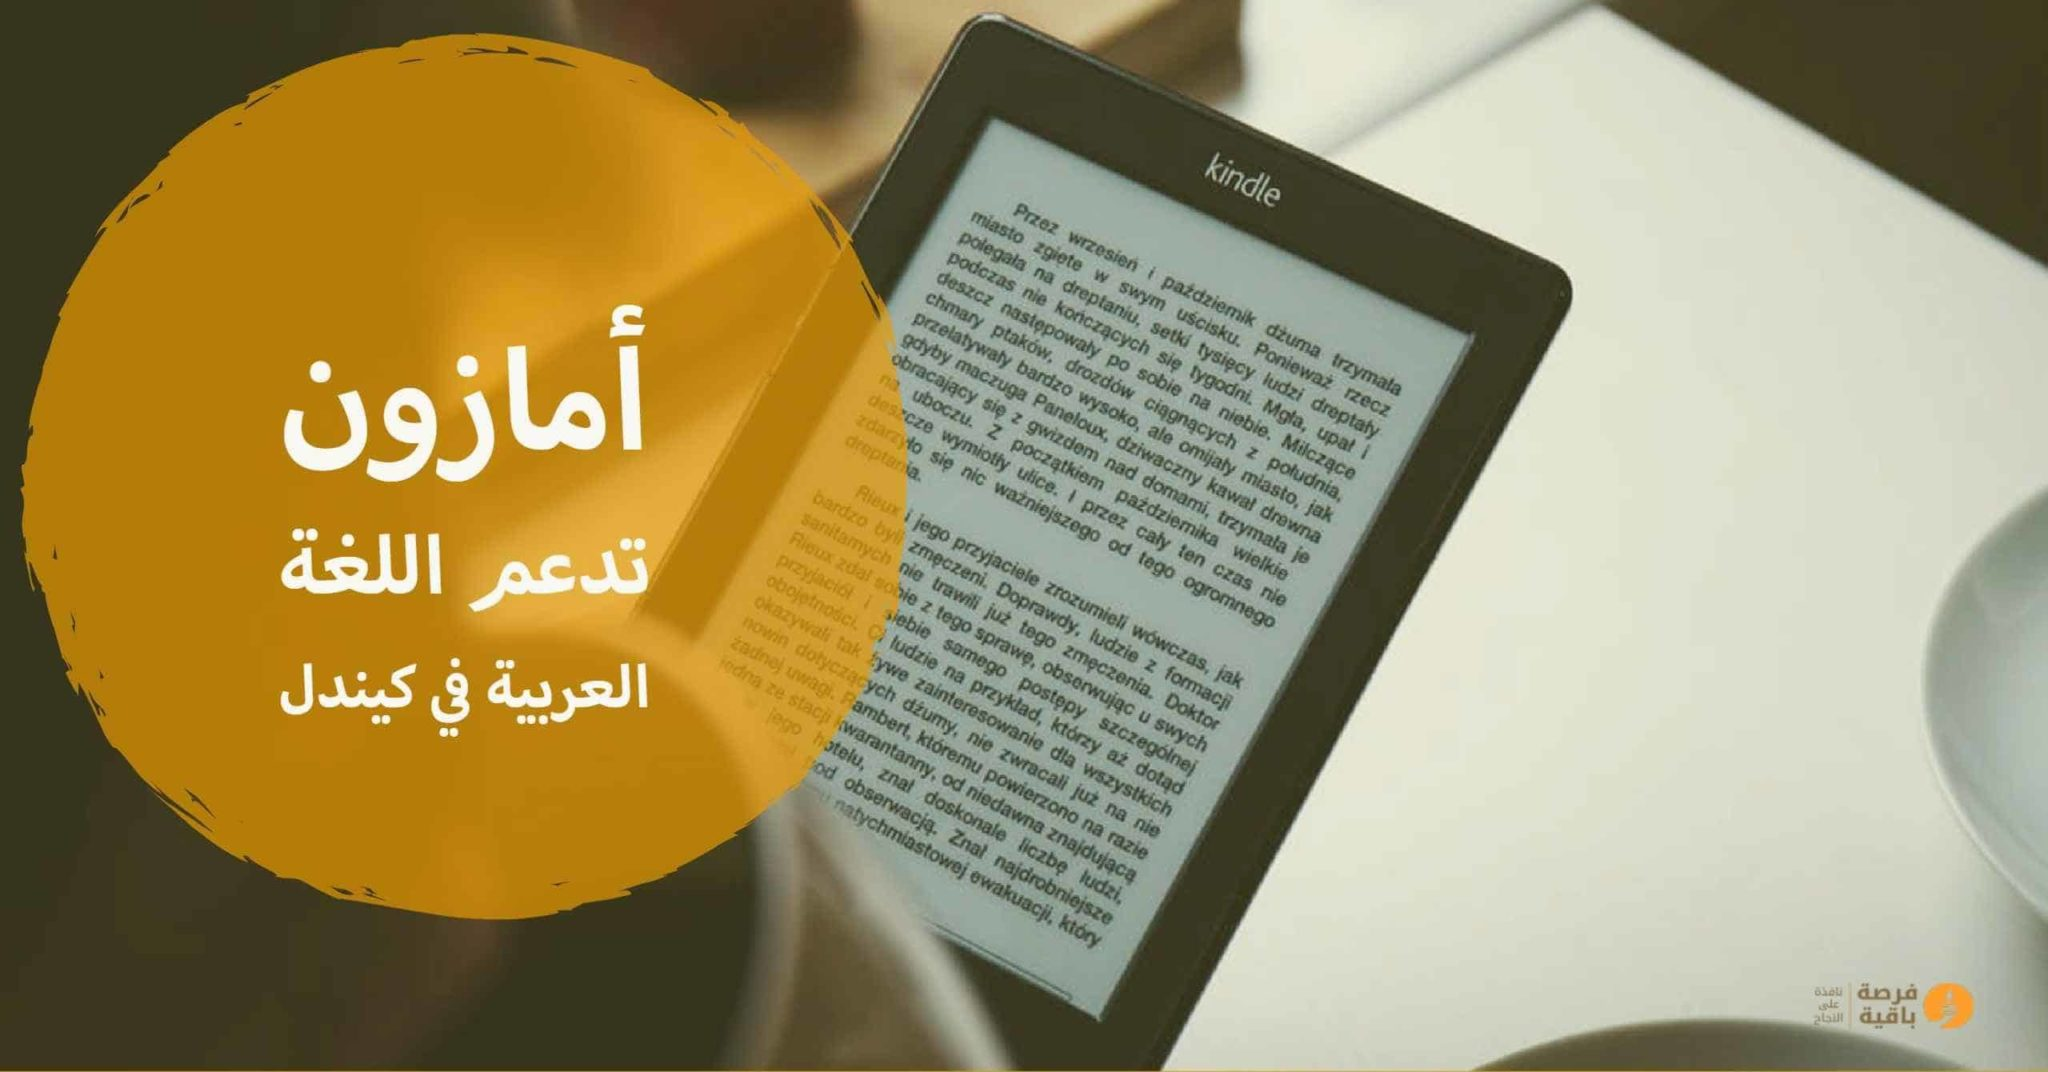 Photo of أخيراً، أمازون تدعم النشر باللغة العربية في كيندل. ماذا عليك فعله الآن؟